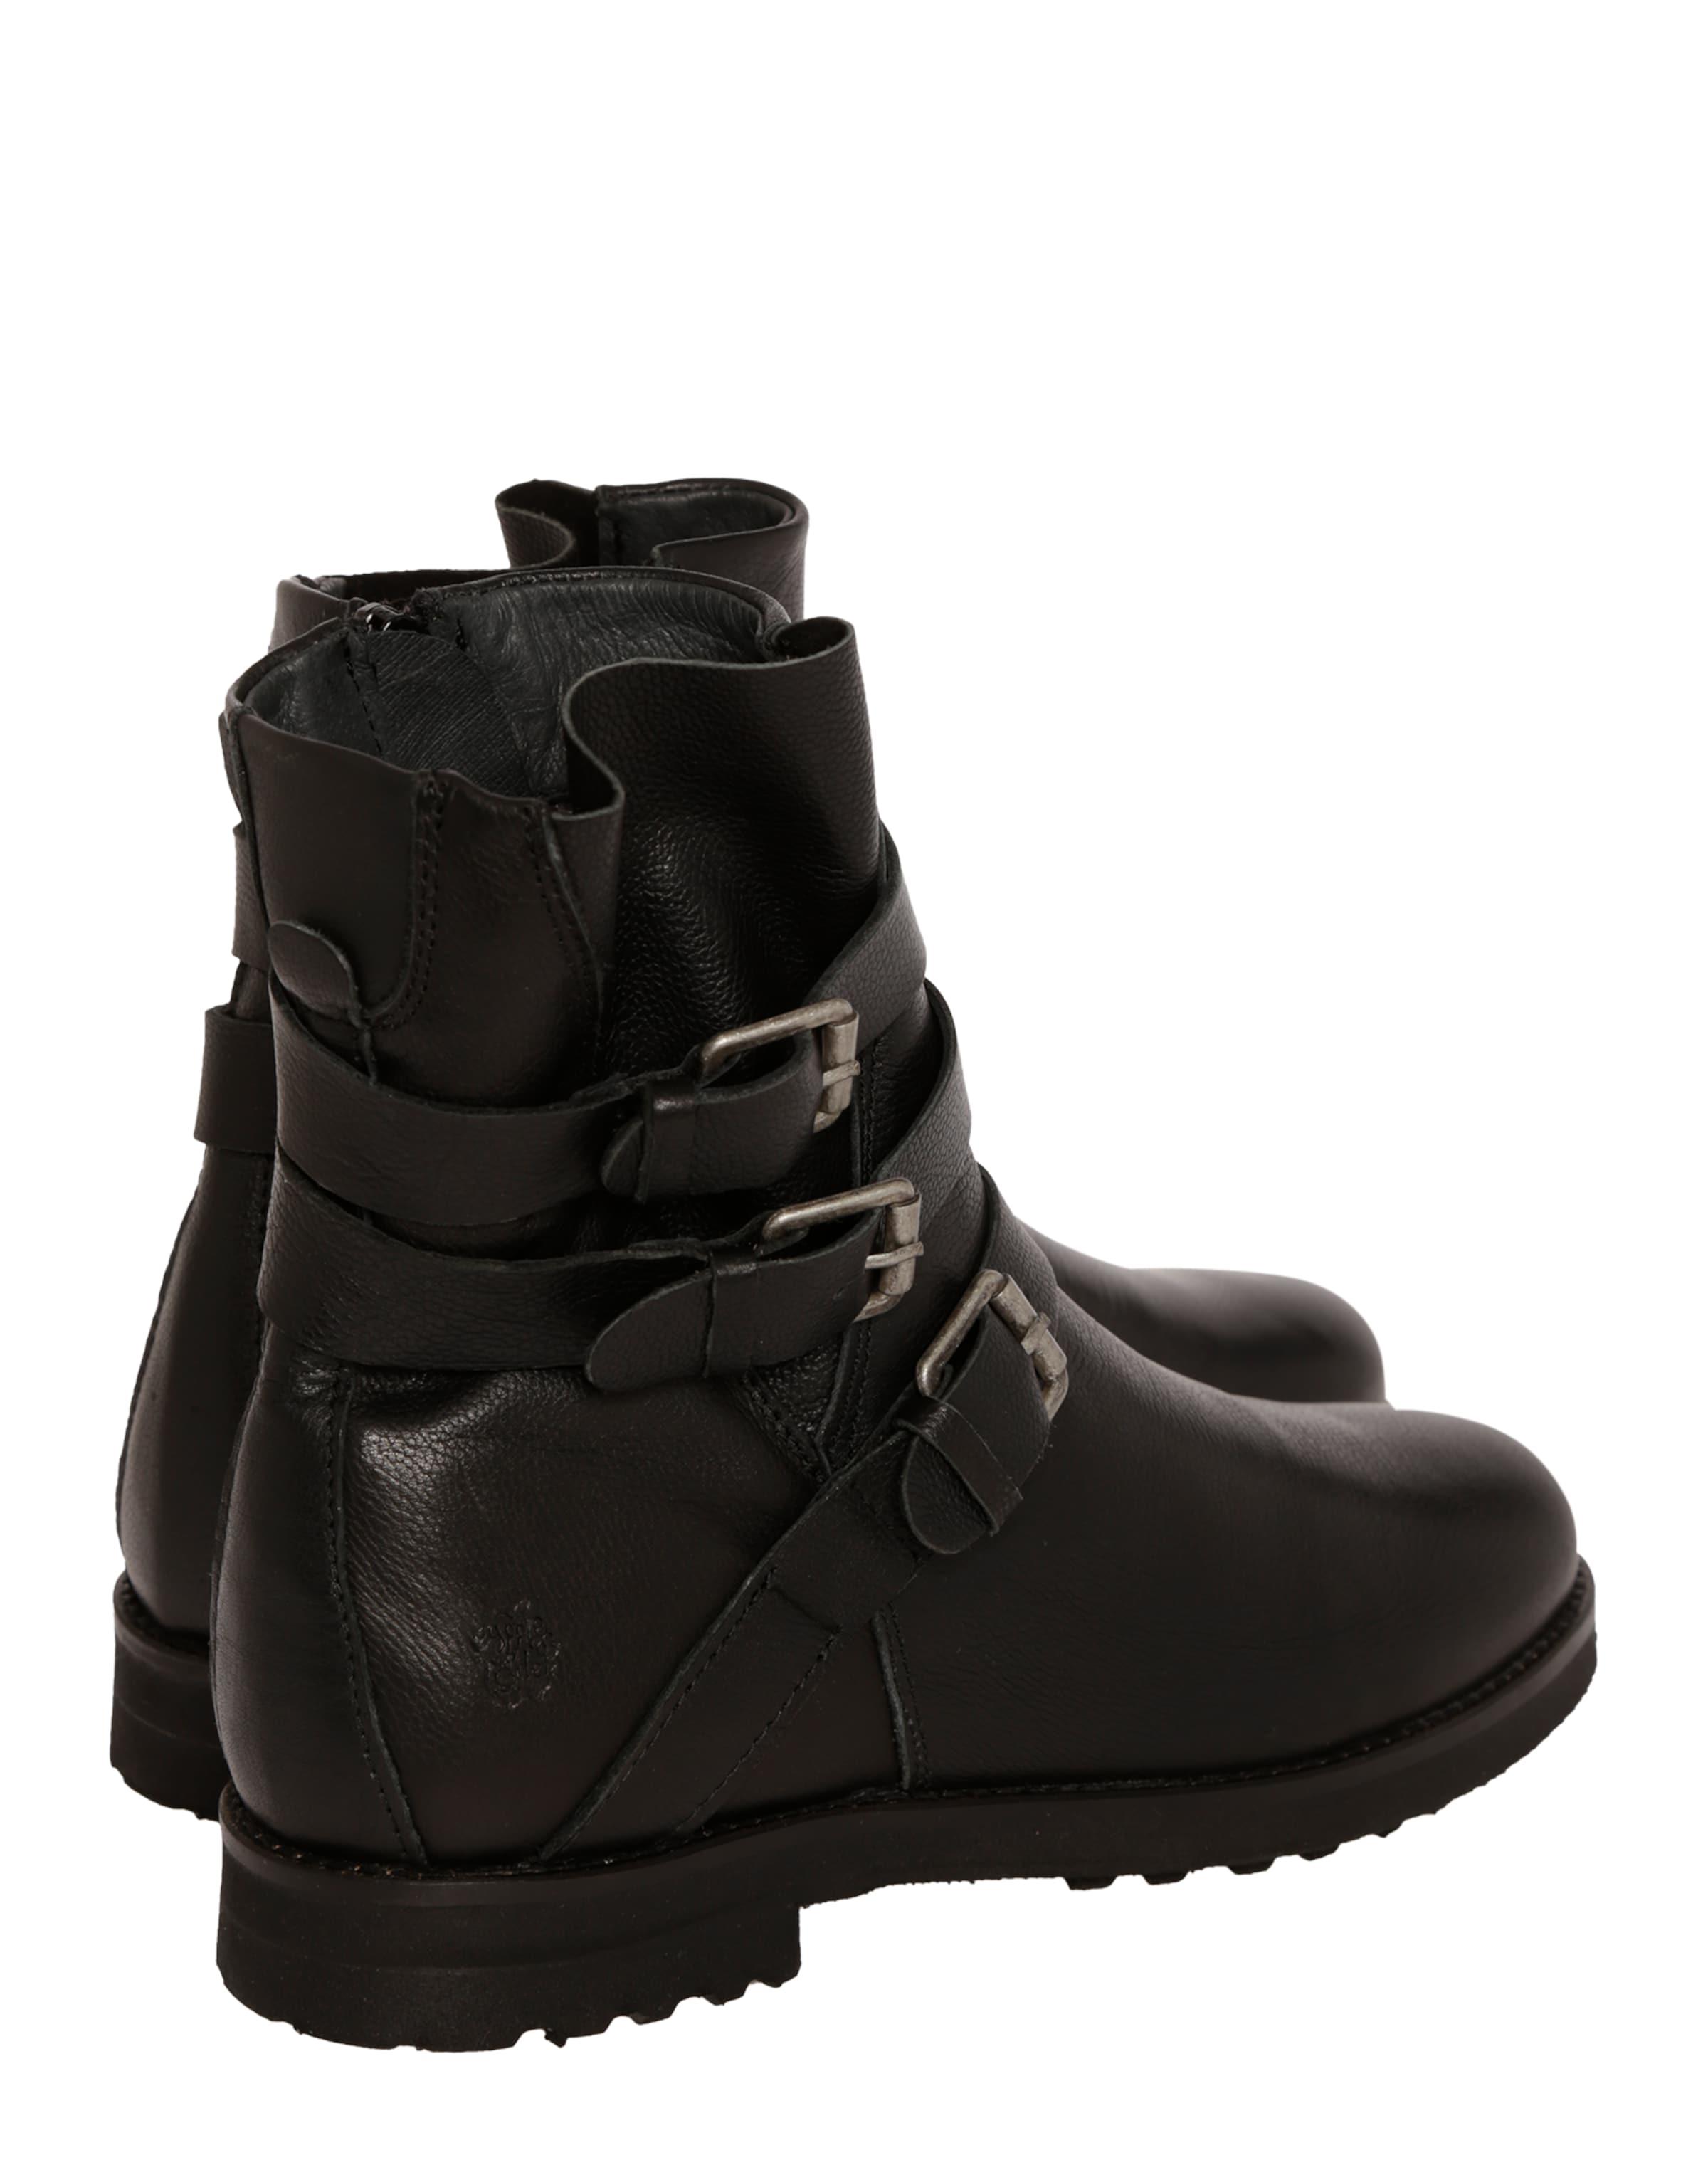 Apple of Eden Leder-Boots 'Alanis' Original Günstiger Preis Gk1XbjF3FN